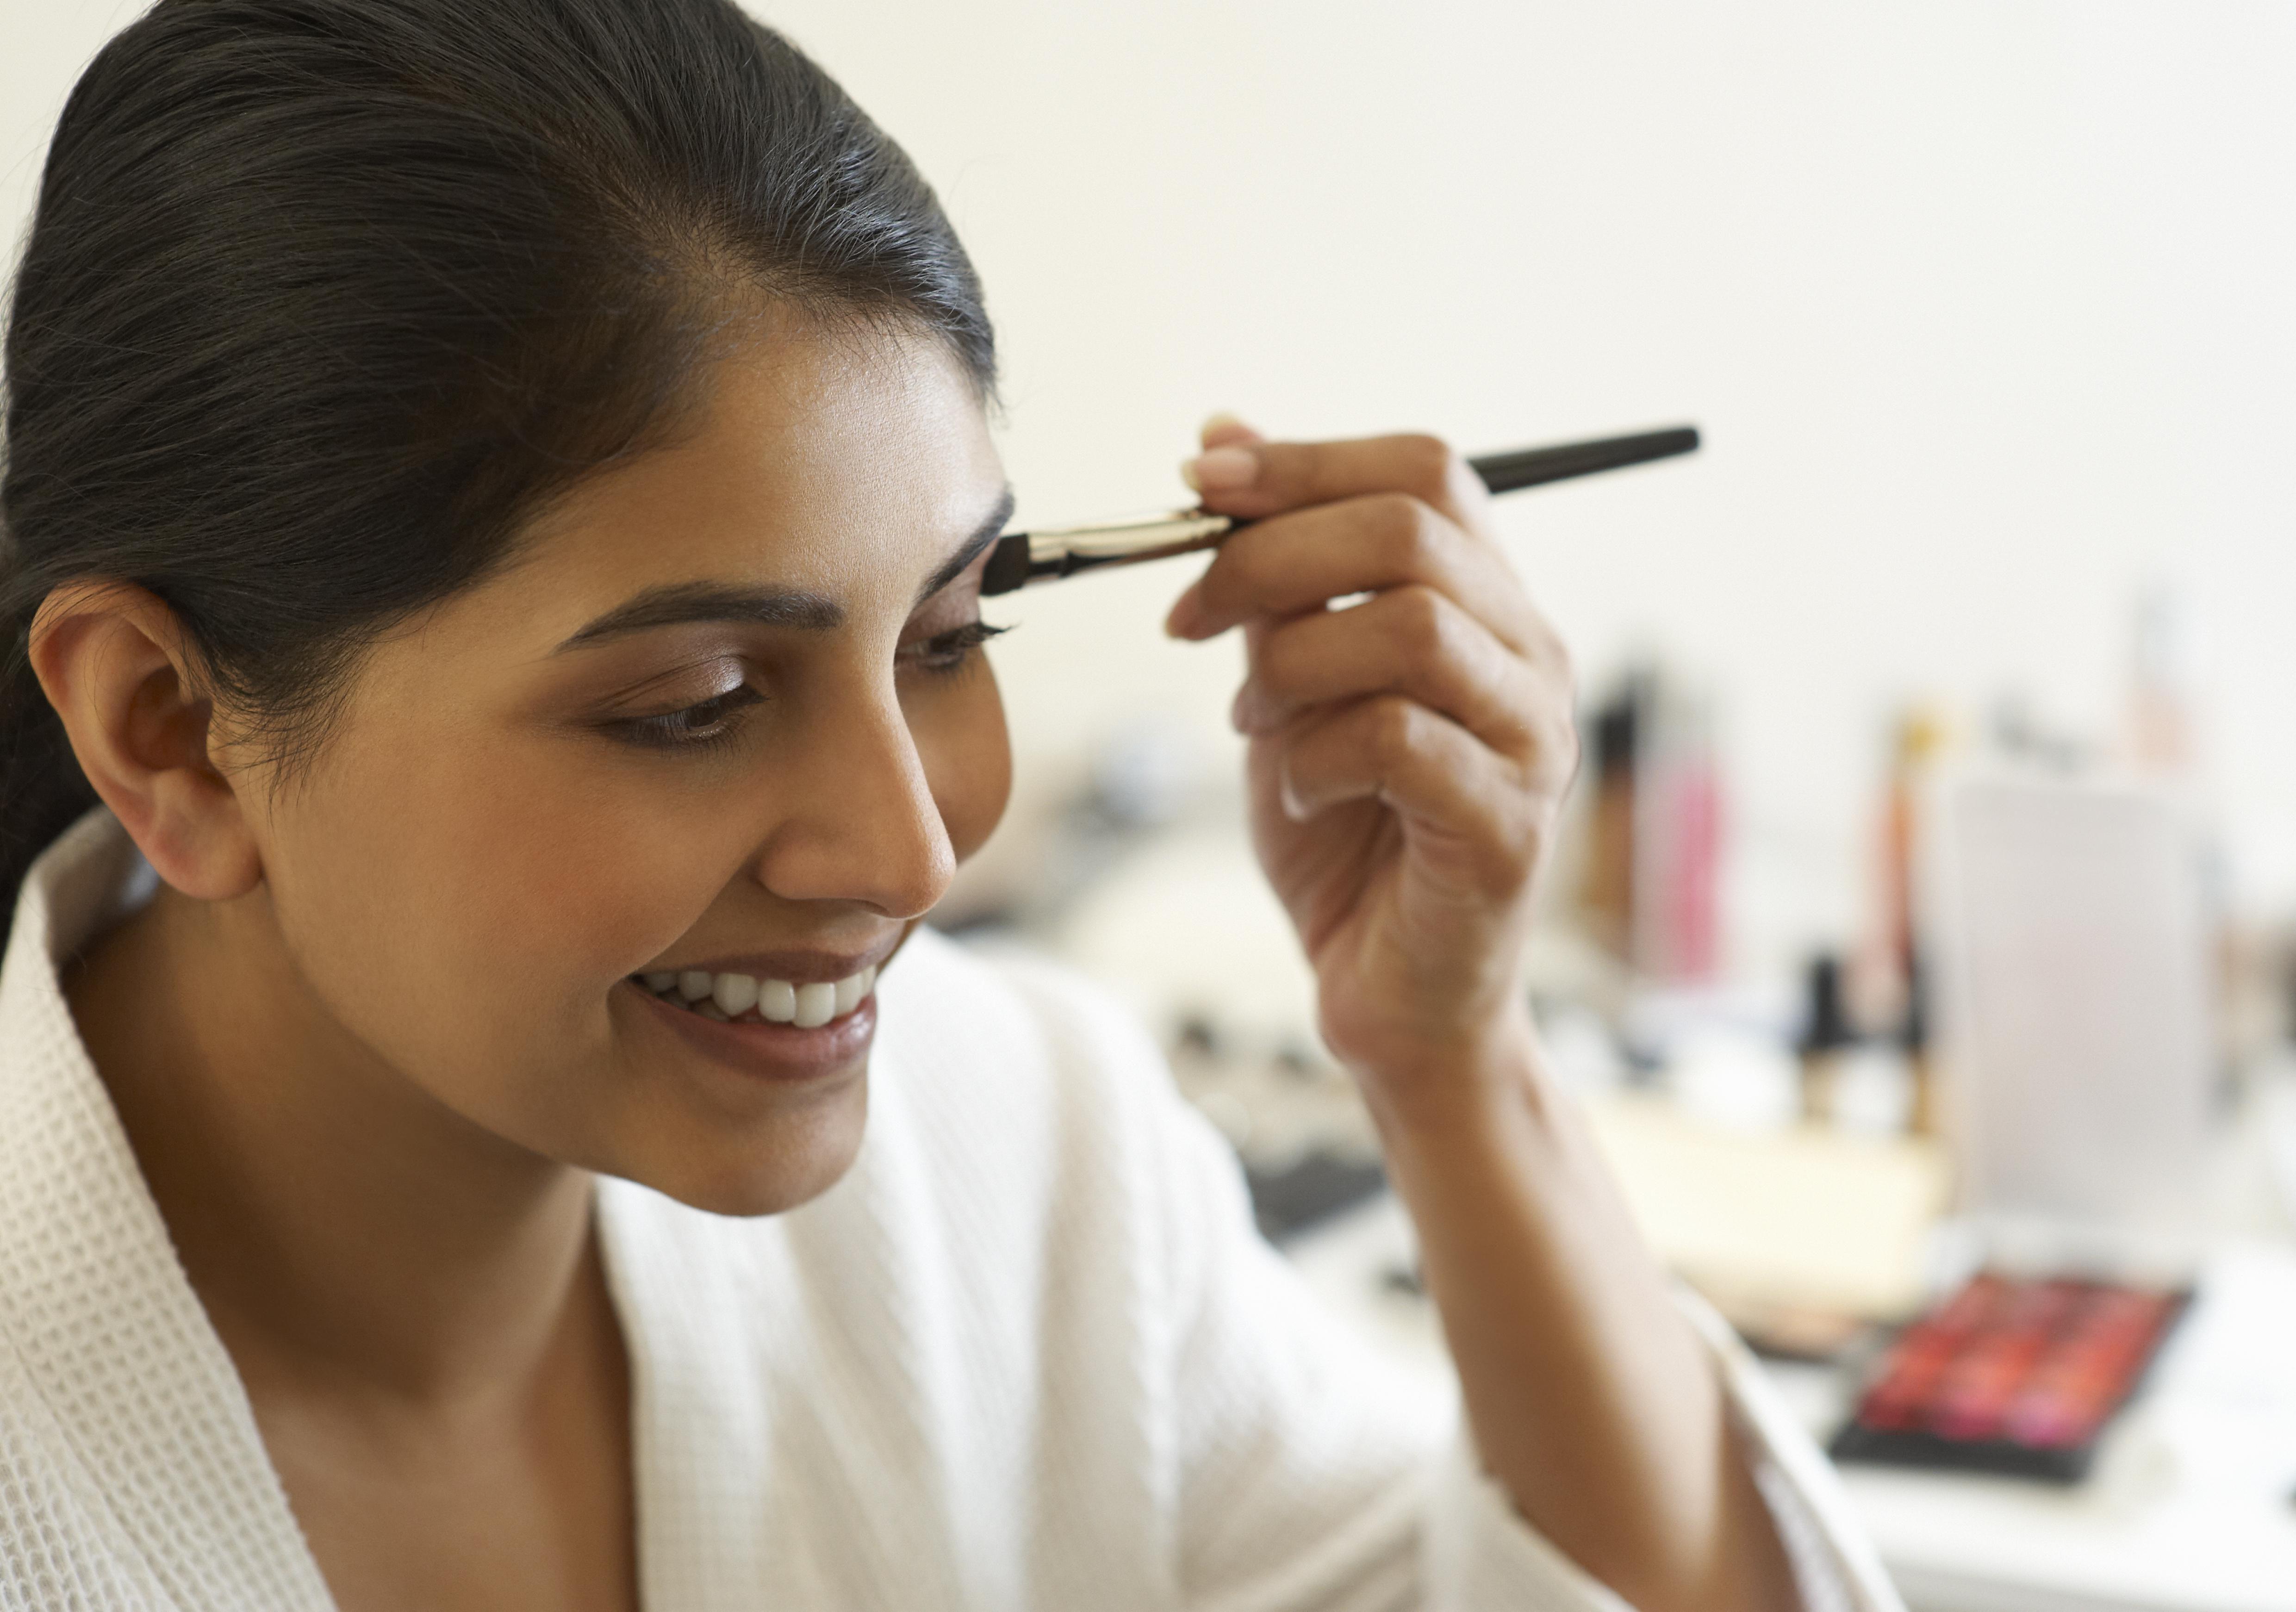 How to apply eye makeup on sagging eyelids